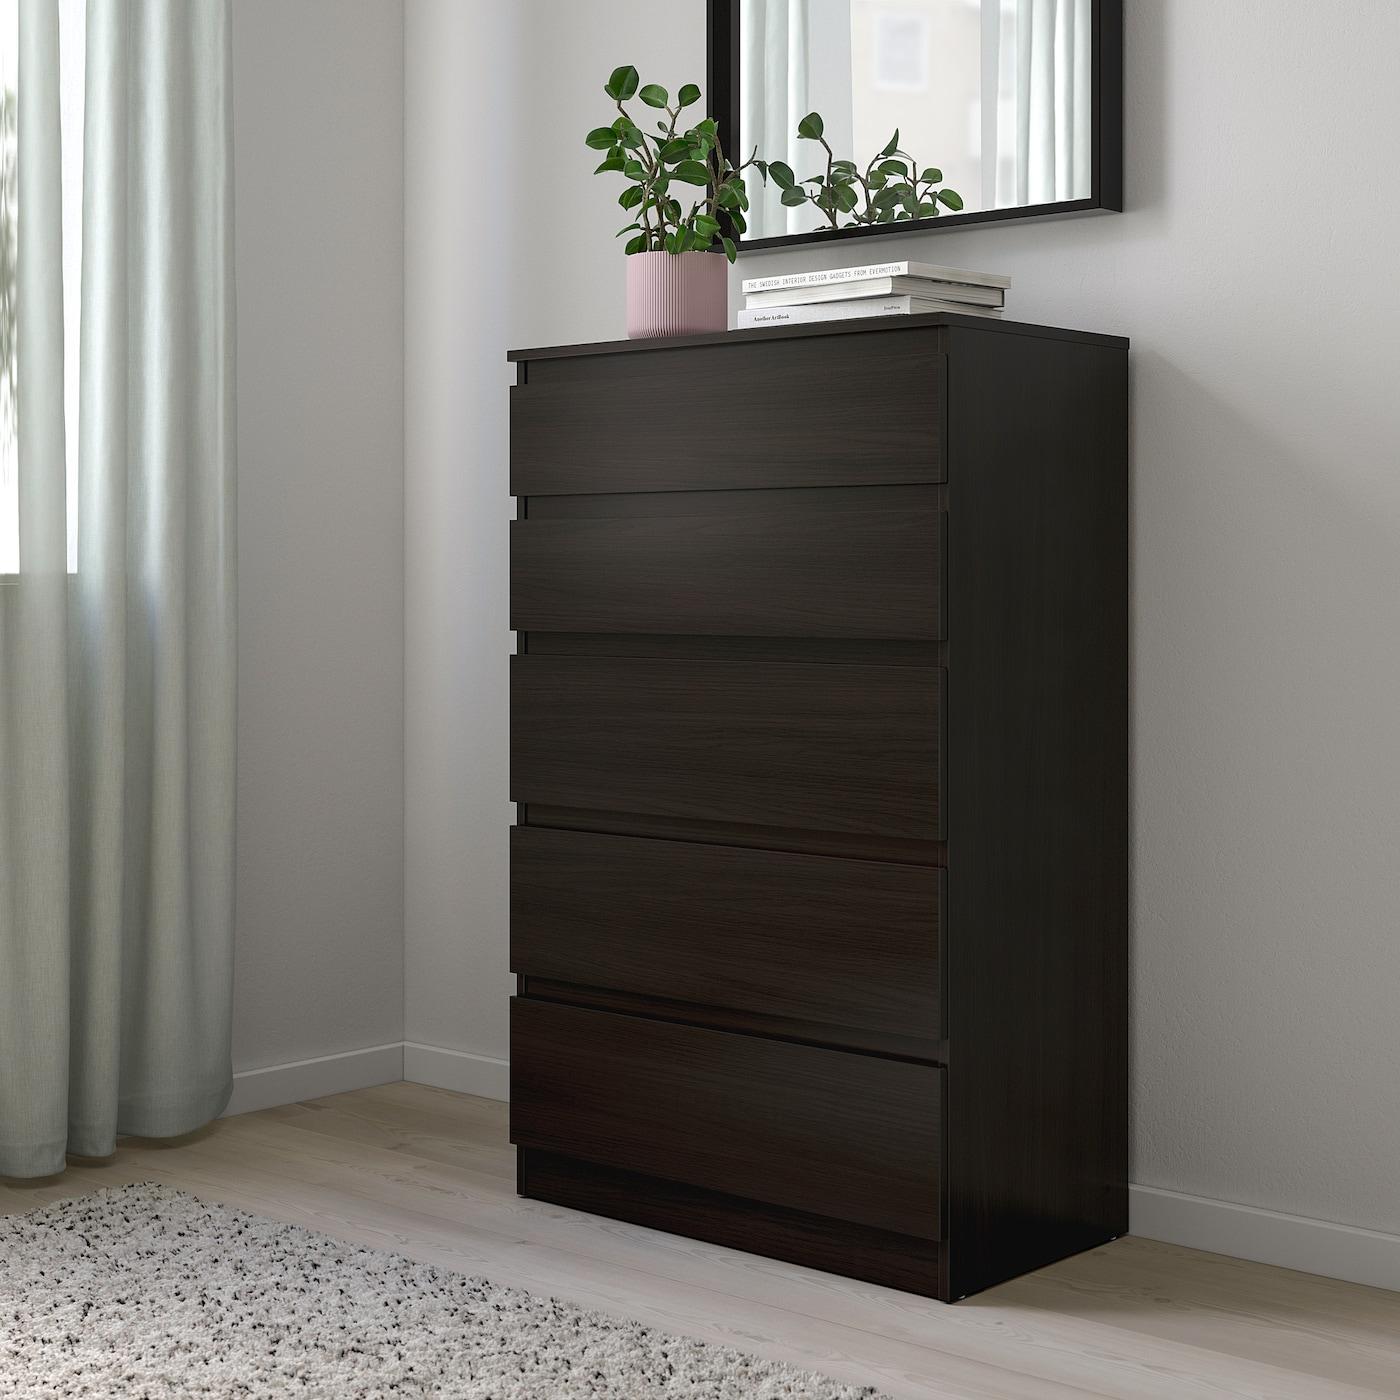 KULLEN Chest of 7 drawers - black-brown 7x7 cm